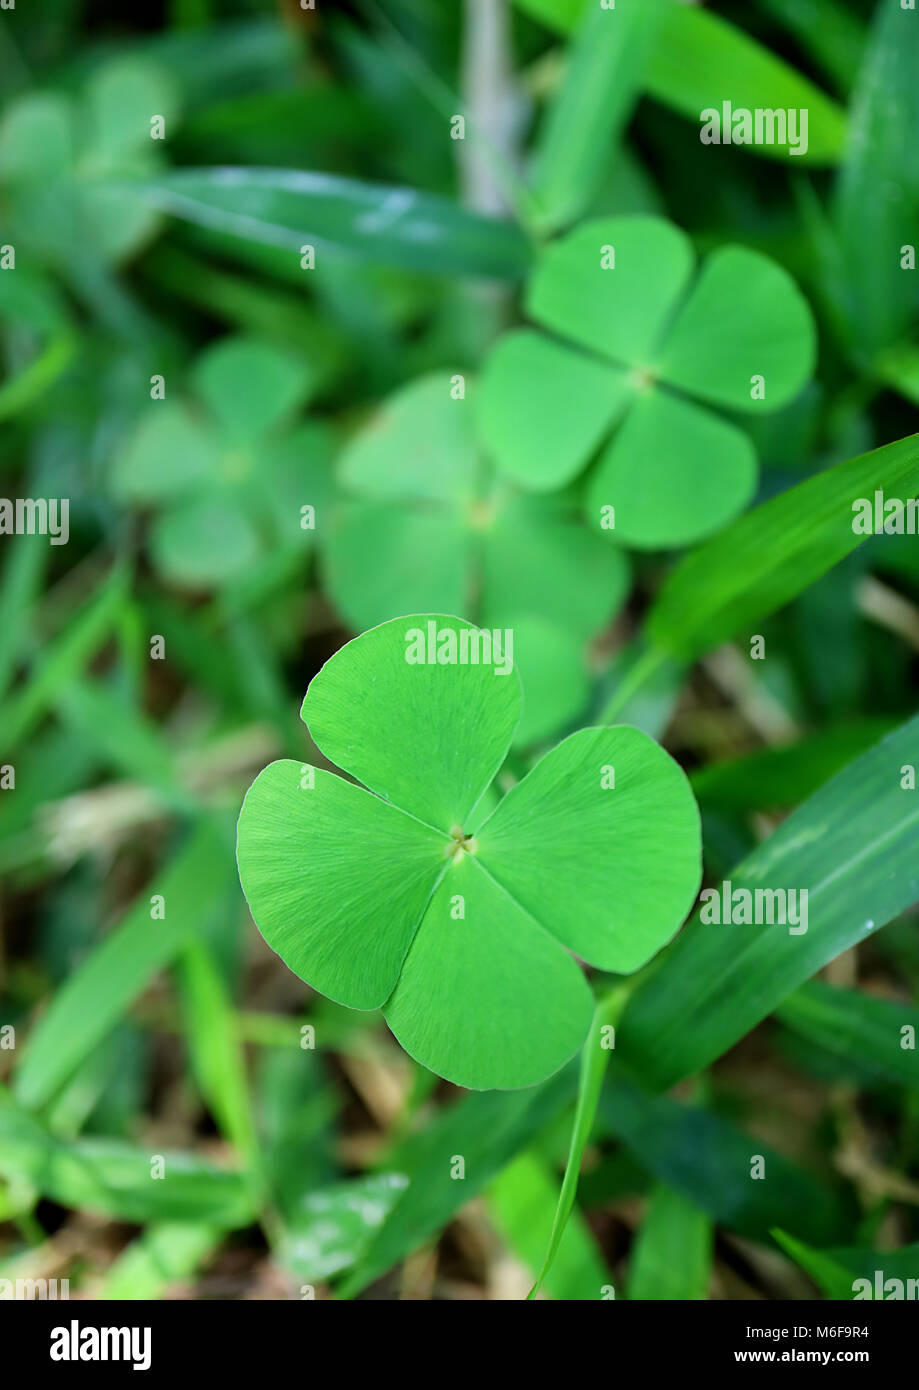 Vertical Photo Of Four Leaf Clover Fern Plants Blurred Background